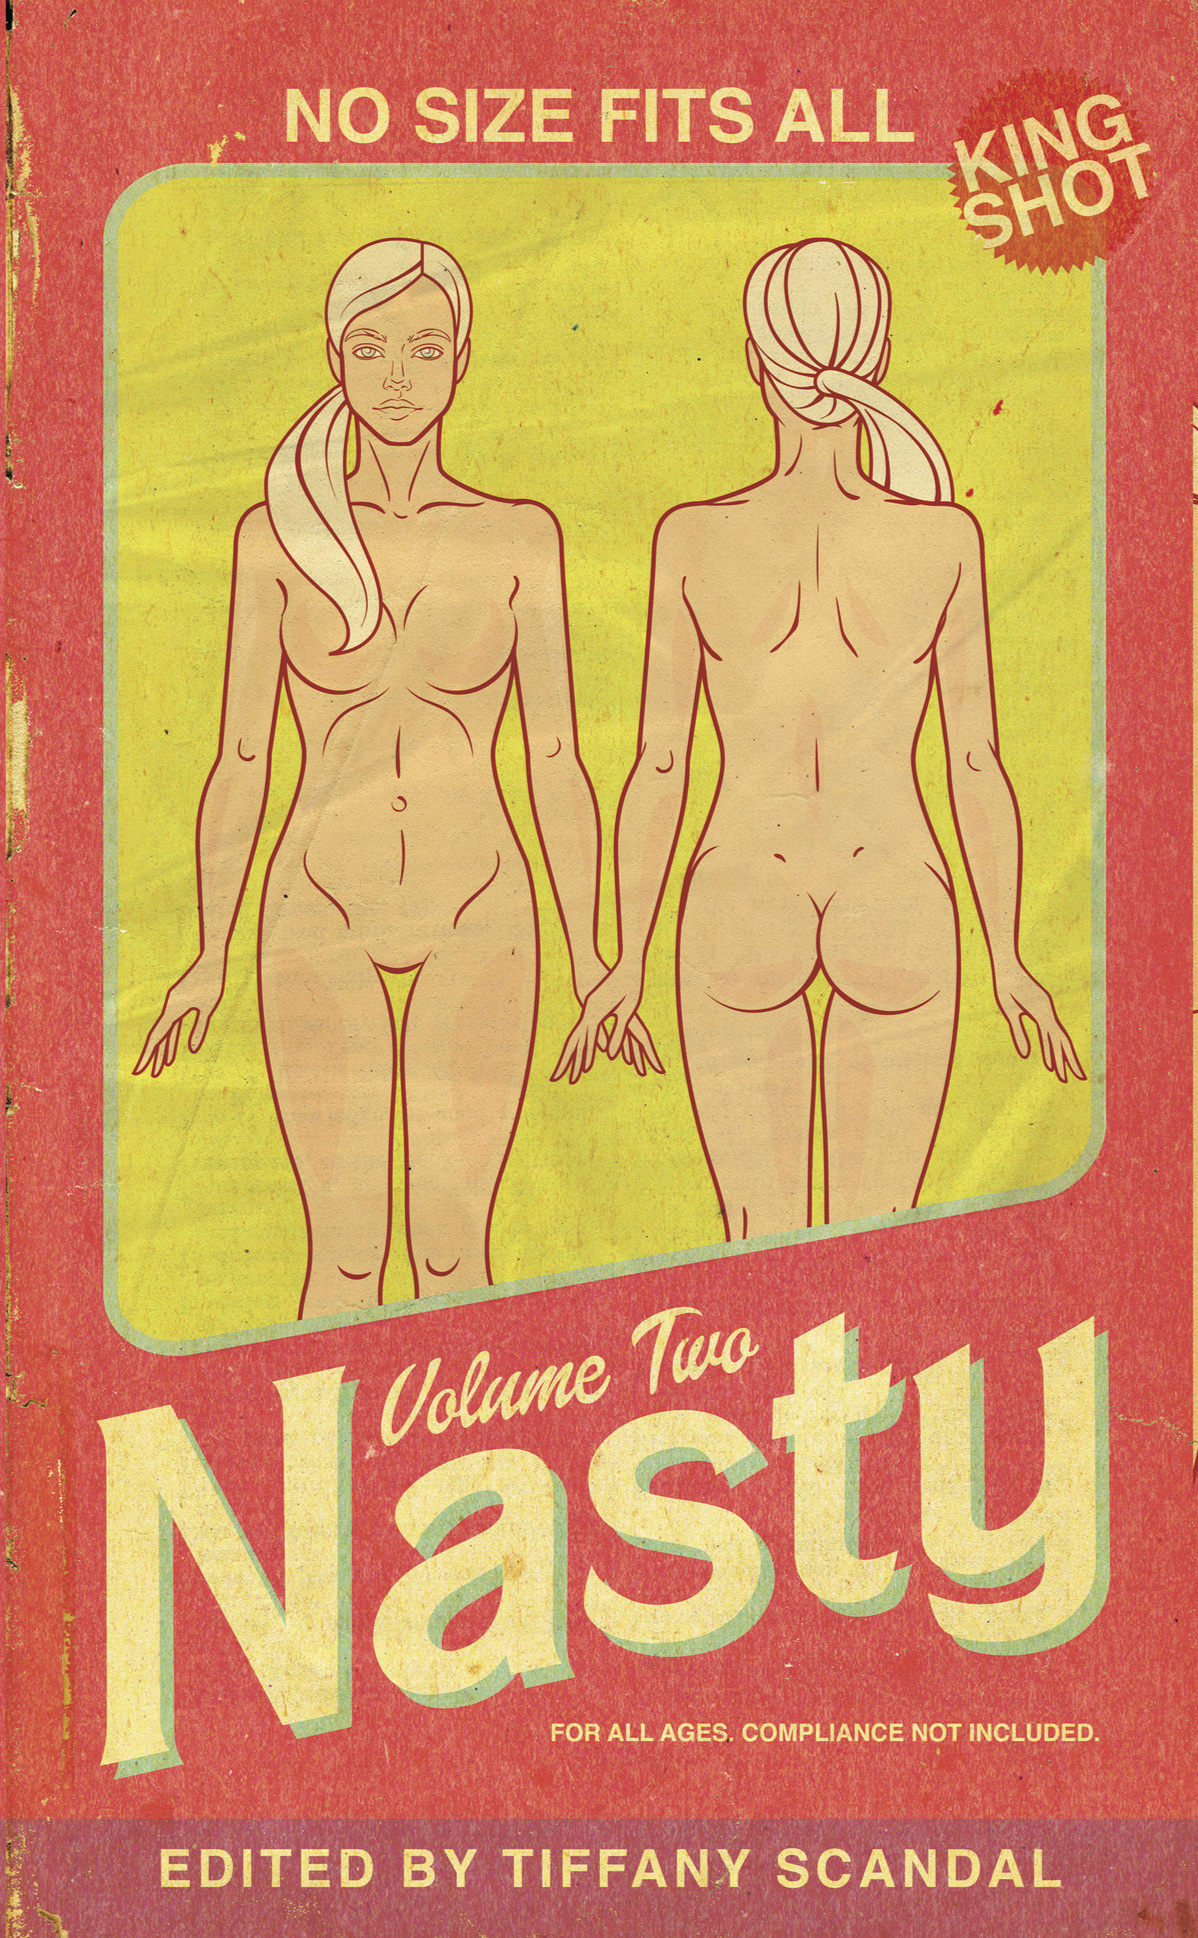 NASTY_vol2.jpg